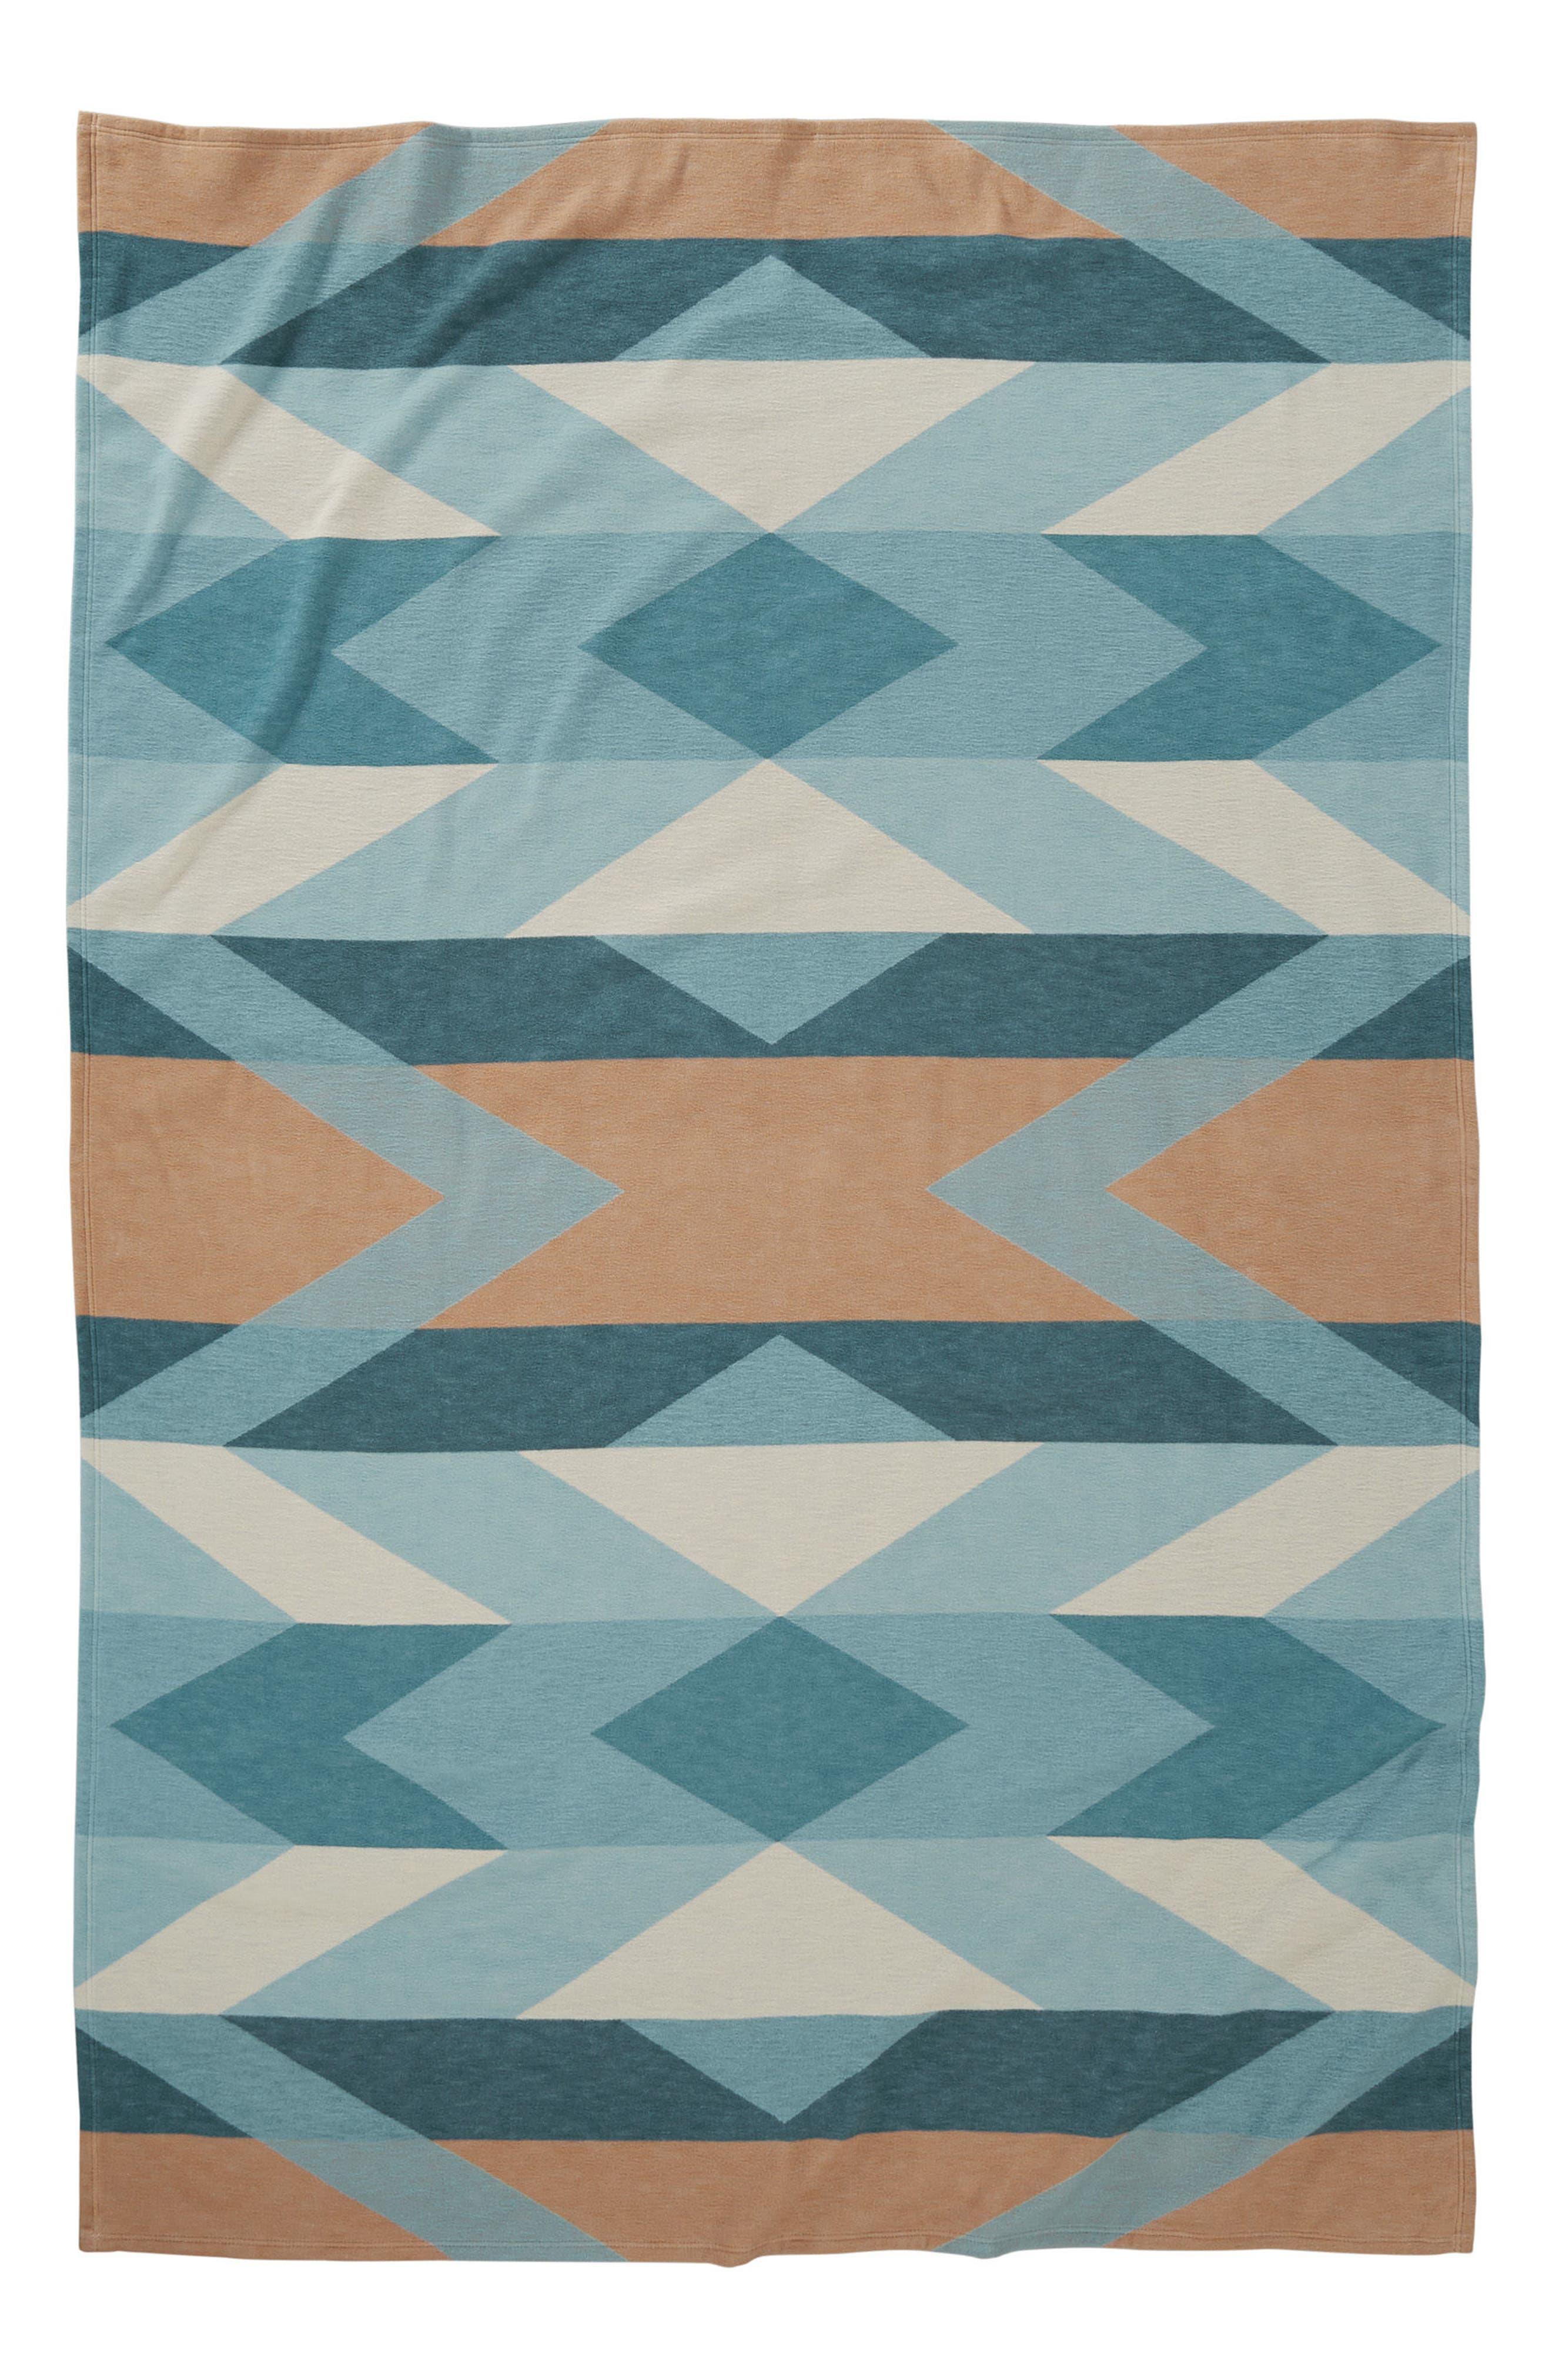 Pima Canyon Throw Blanket,                             Main thumbnail 1, color,                             400